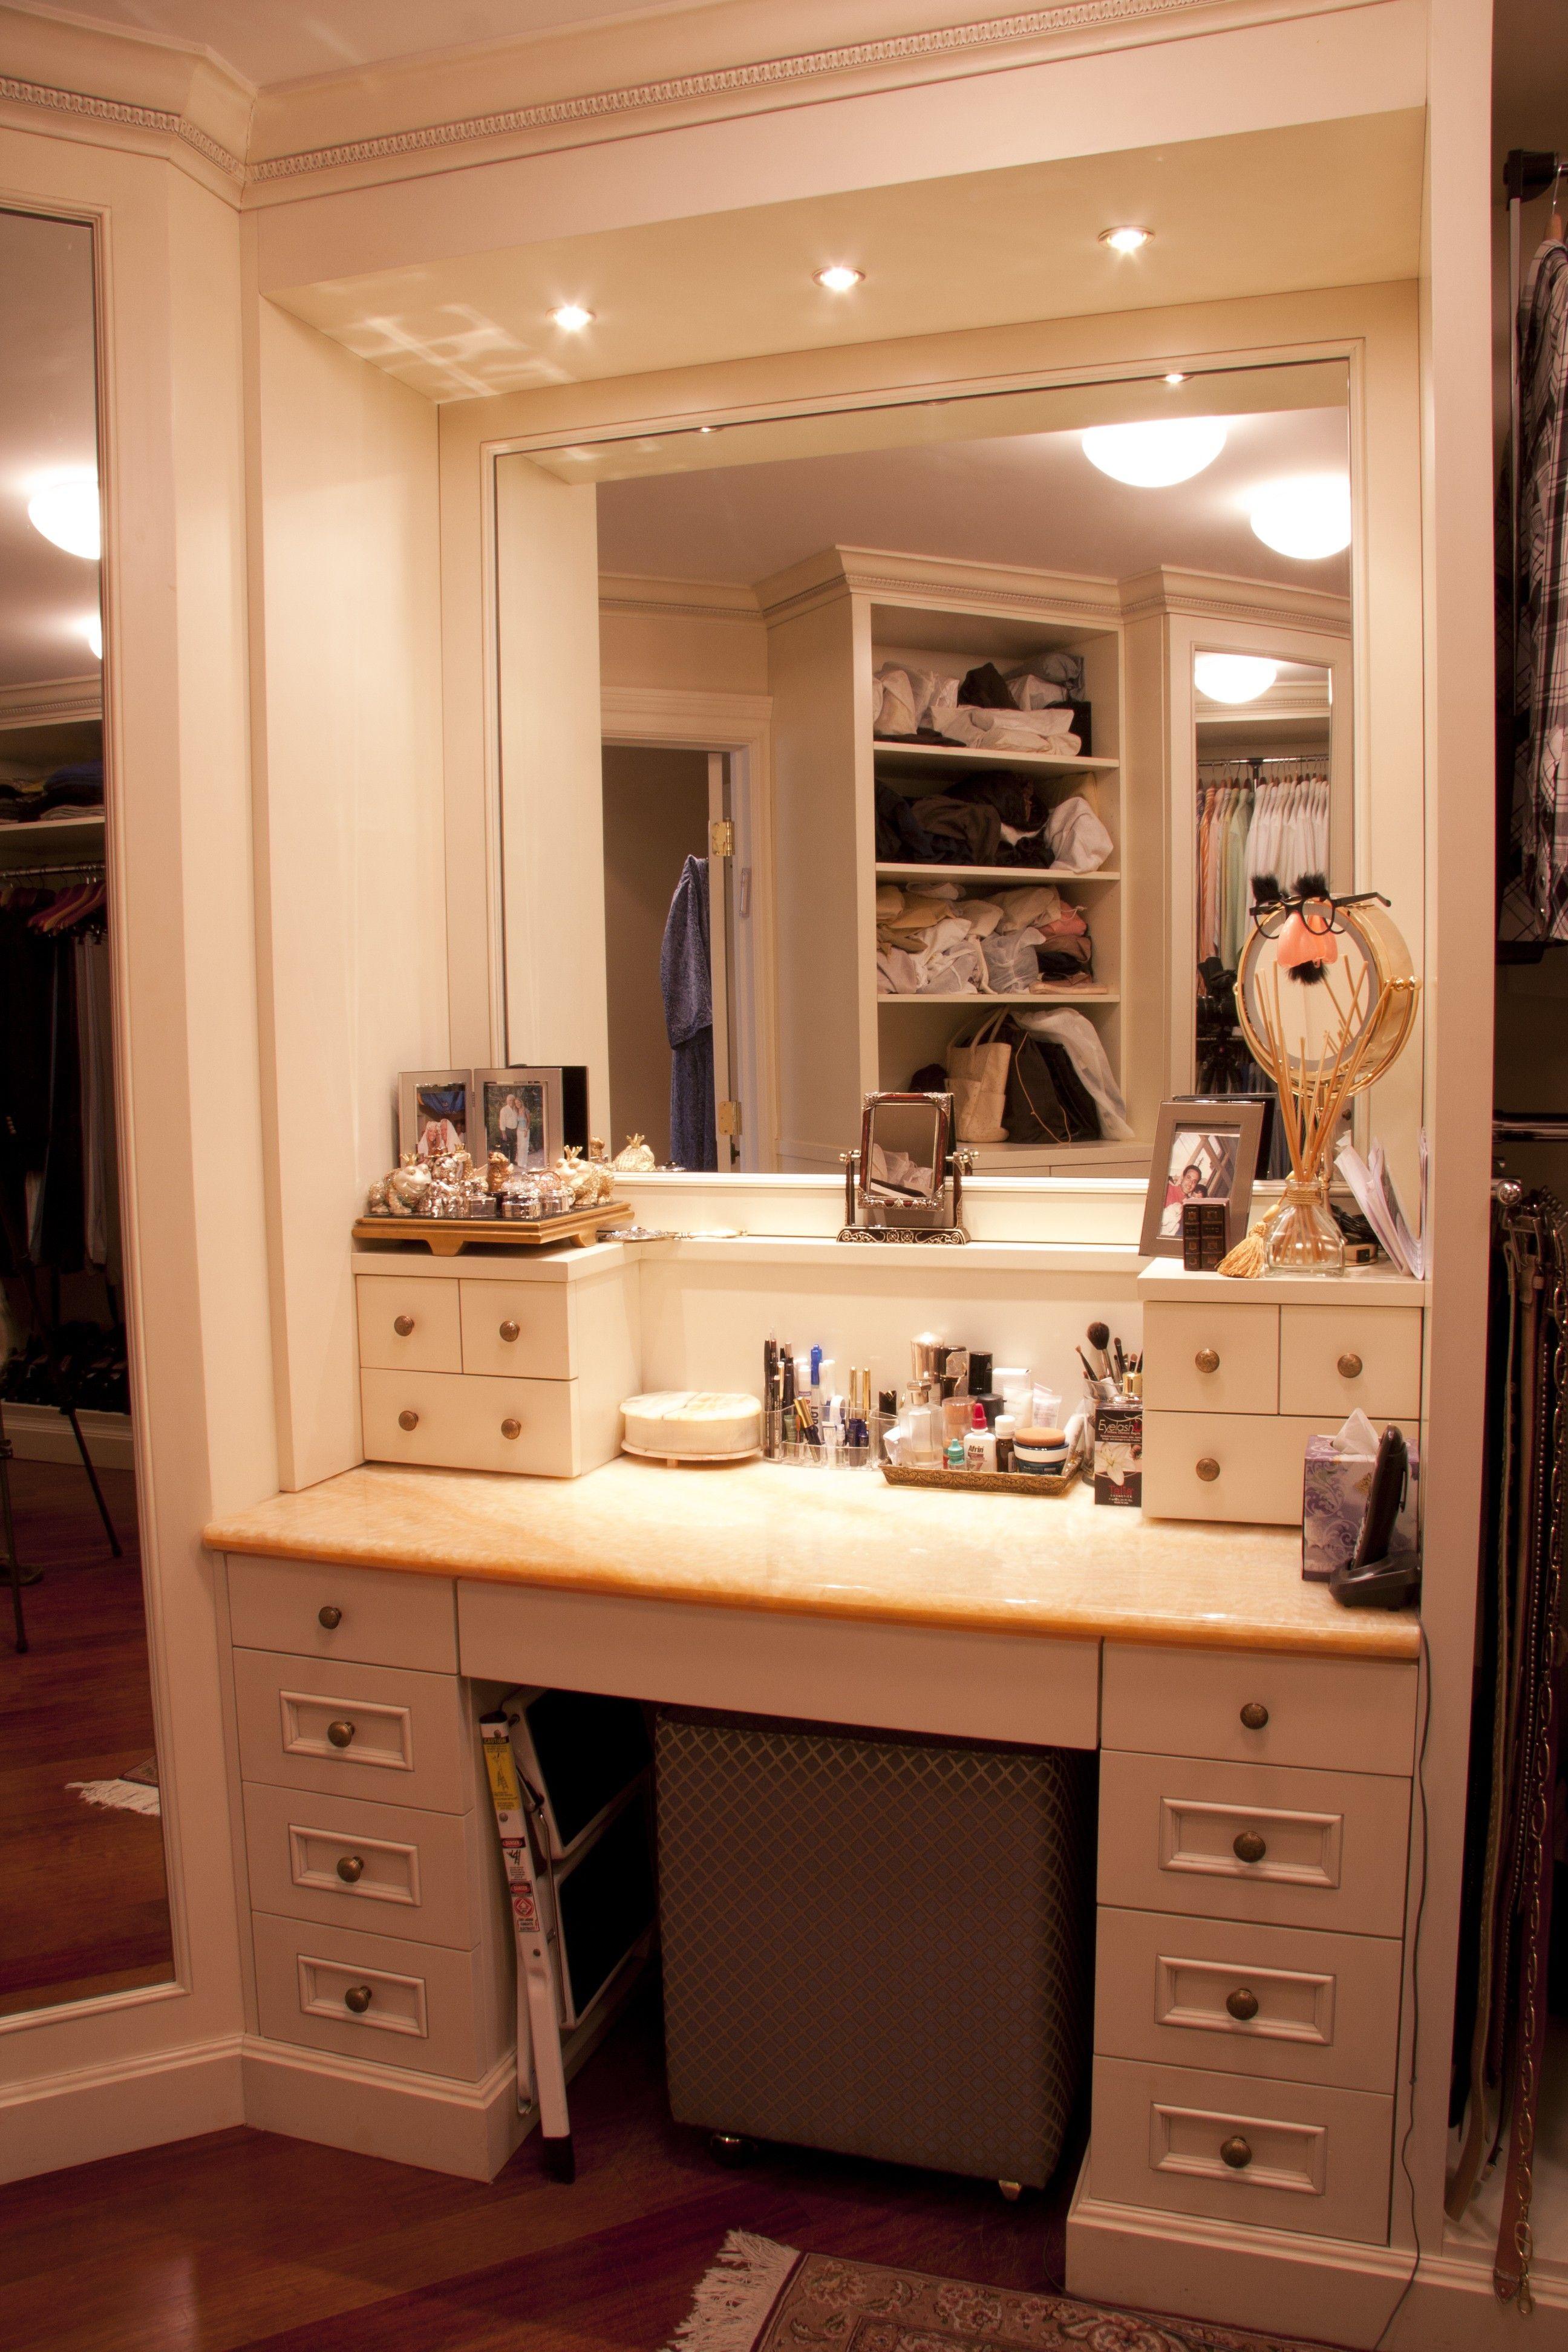 25 Rustic Style Ideas With Rustic Bathroom Vanities Bathroom With Makeup Vanity Closet Vanity Closet Bedroom